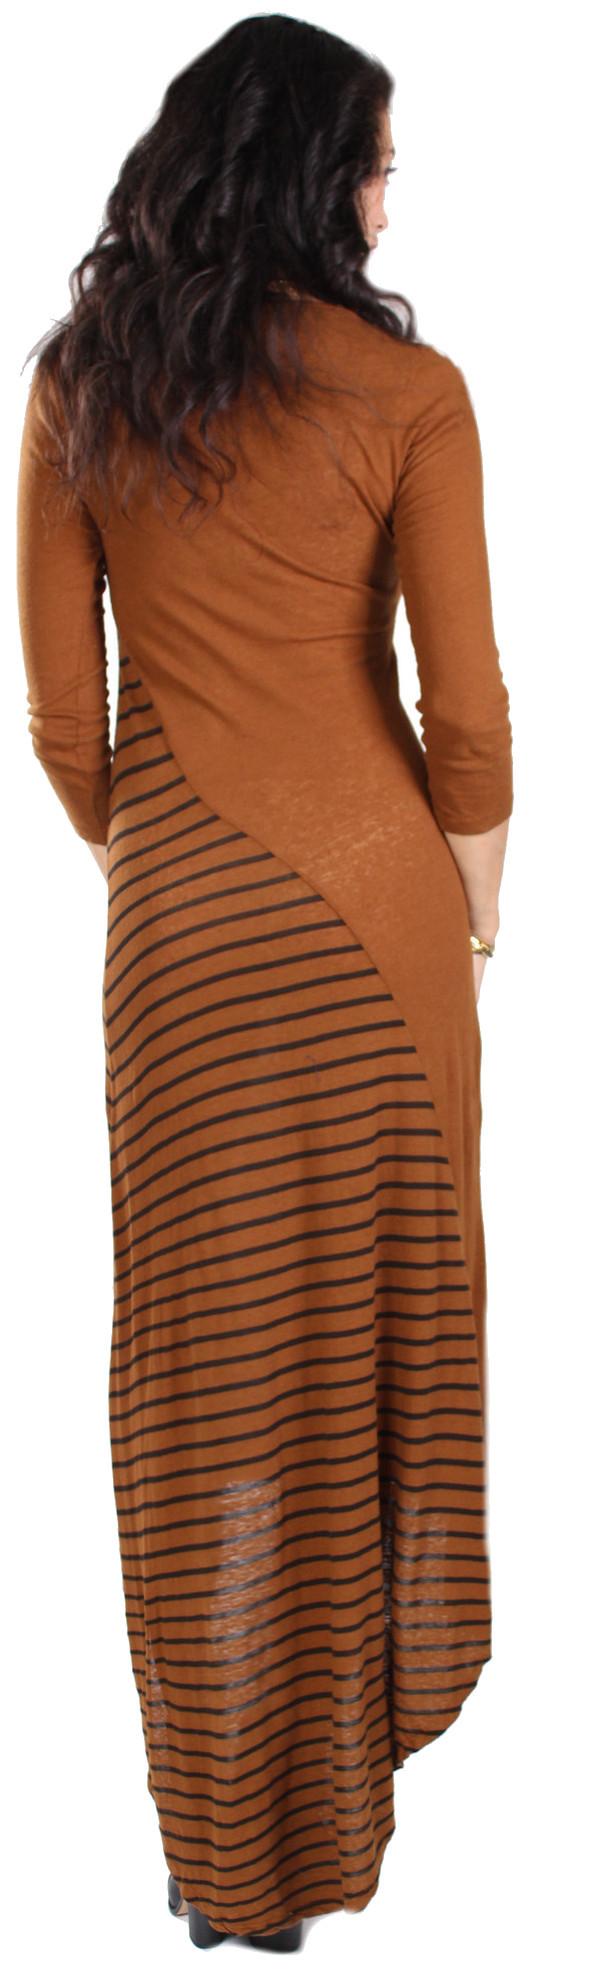 My Line Aspen Contrast Dress